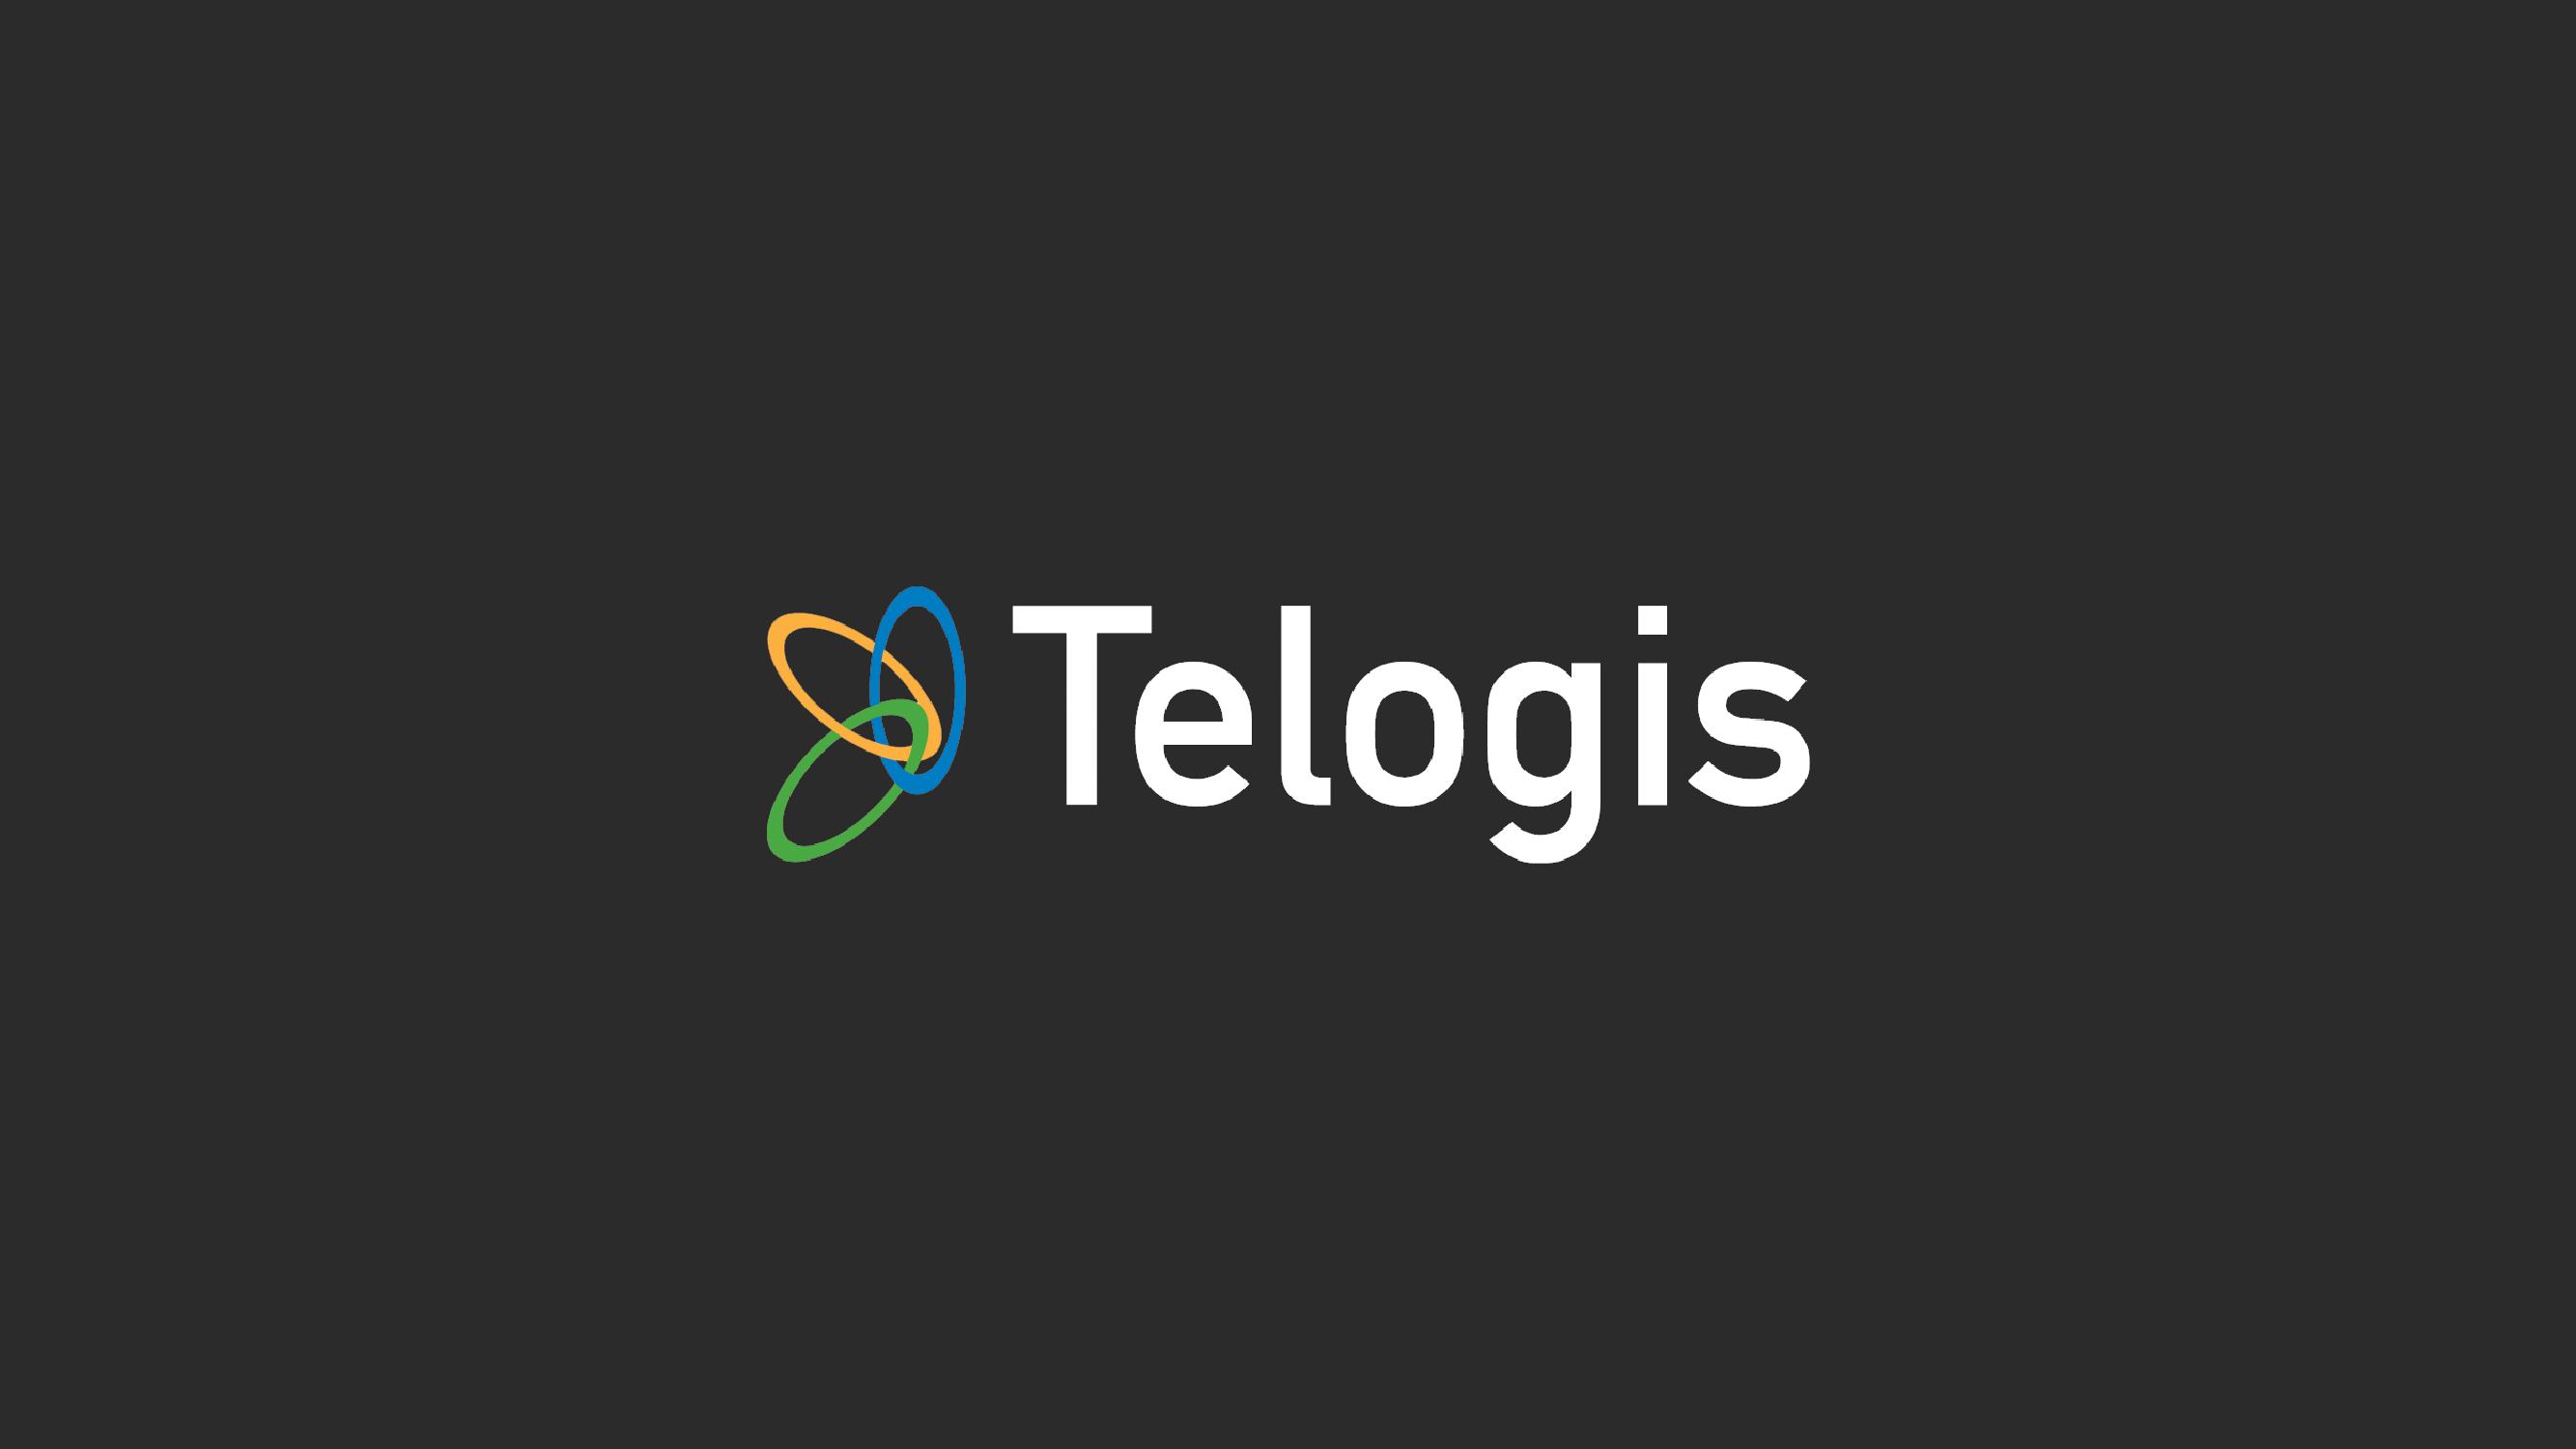 IoT Logo Design Reflections Filament Kontaktio And Telogis